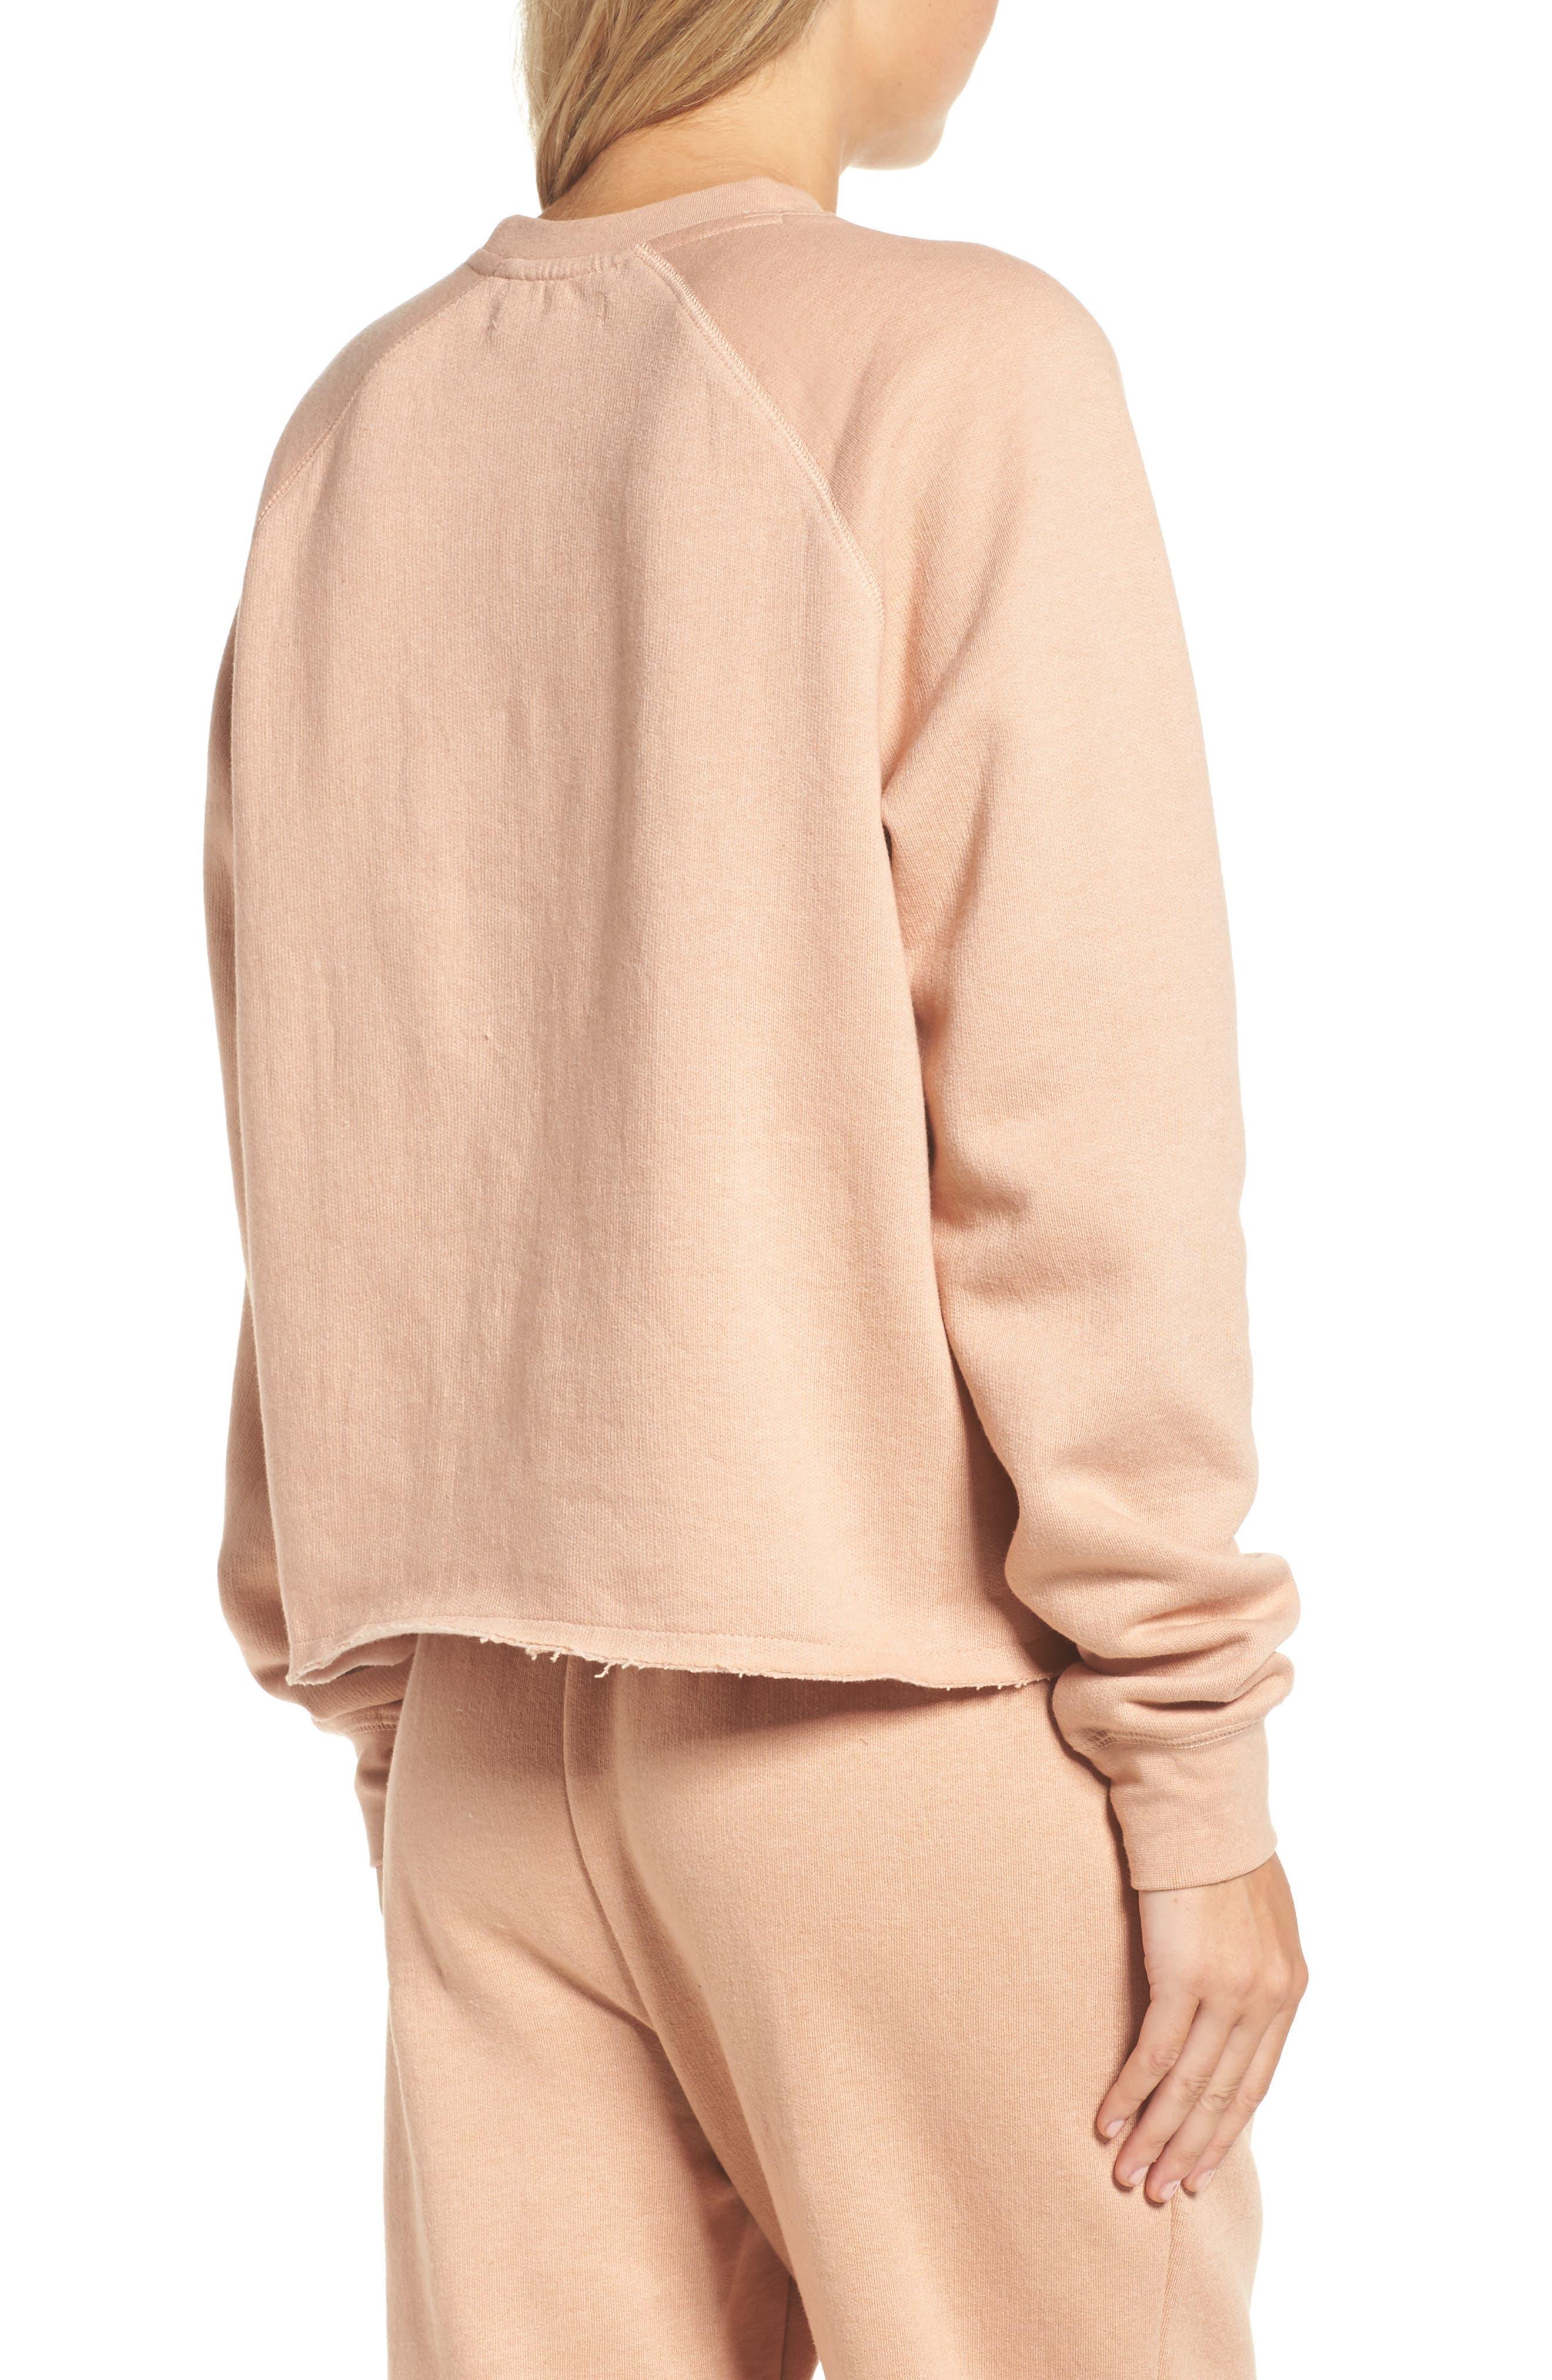 Middle Sister Blonde Sweatshirt,                             Alternate thumbnail 2, color,                             Beige